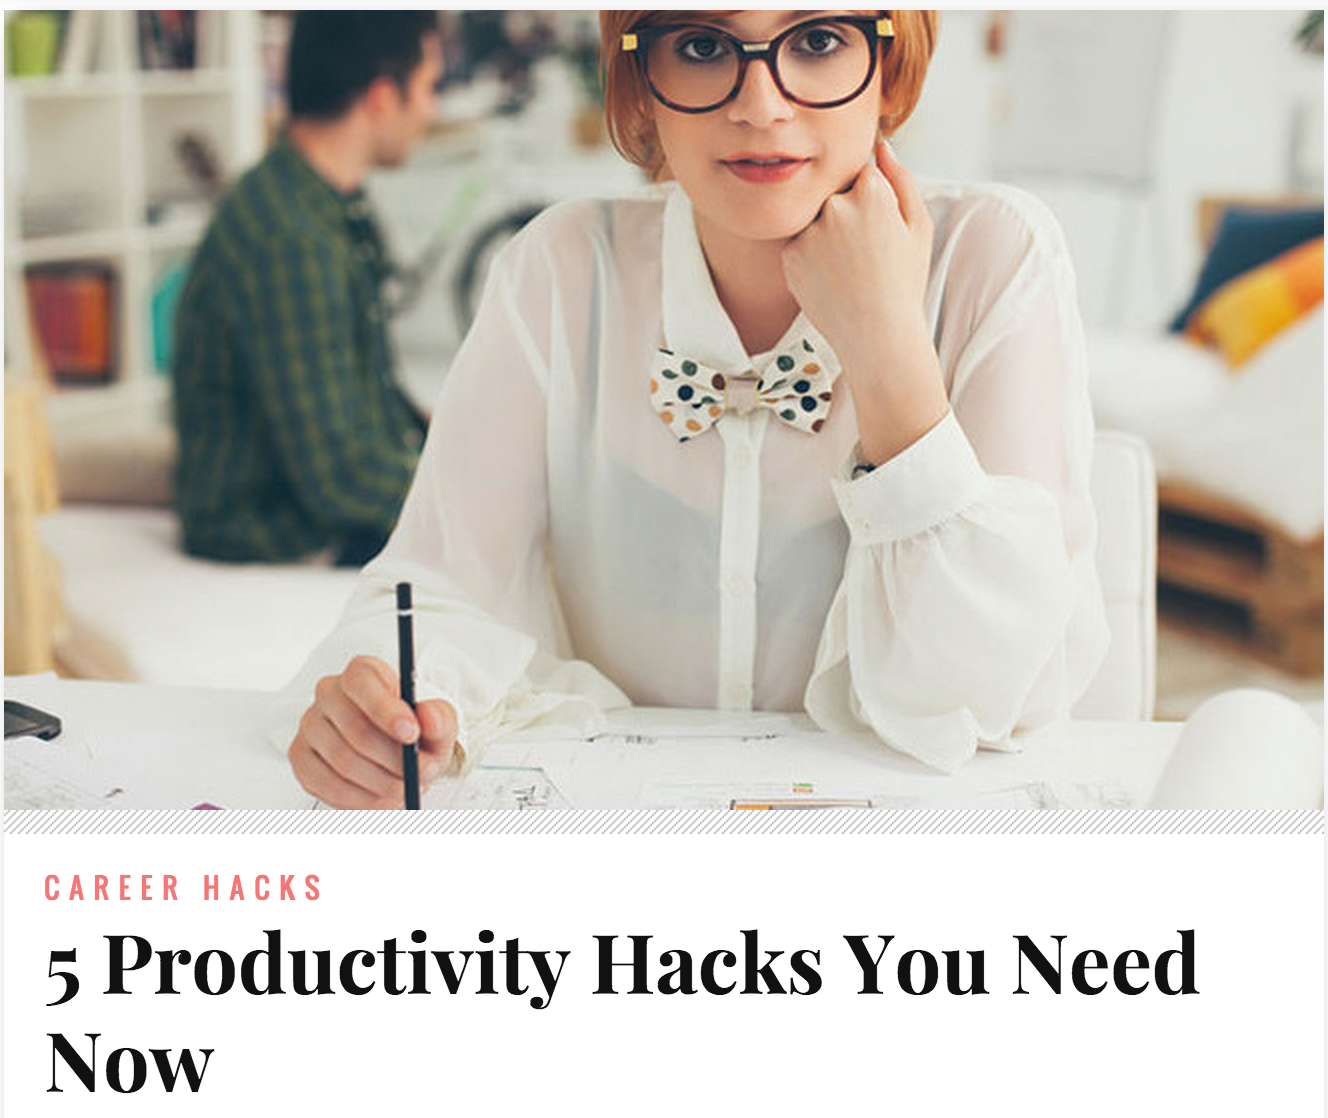 5 Productivity Hacks You Need Now